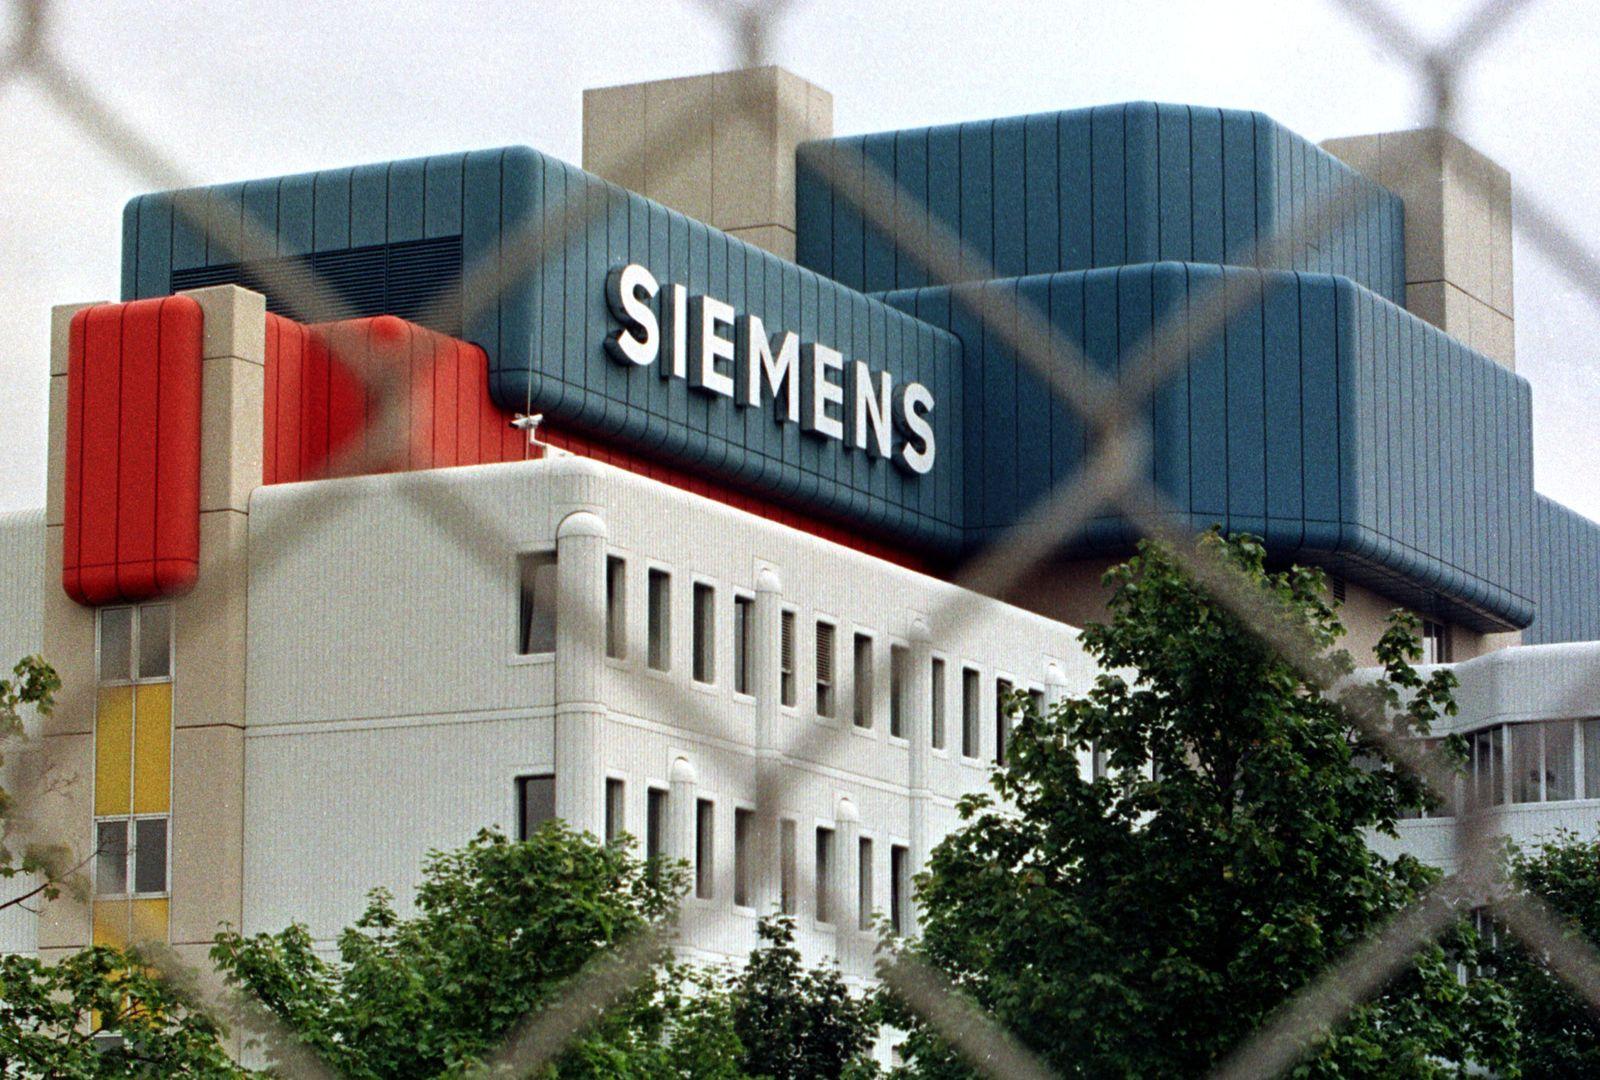 Siemens / Zentrale / München